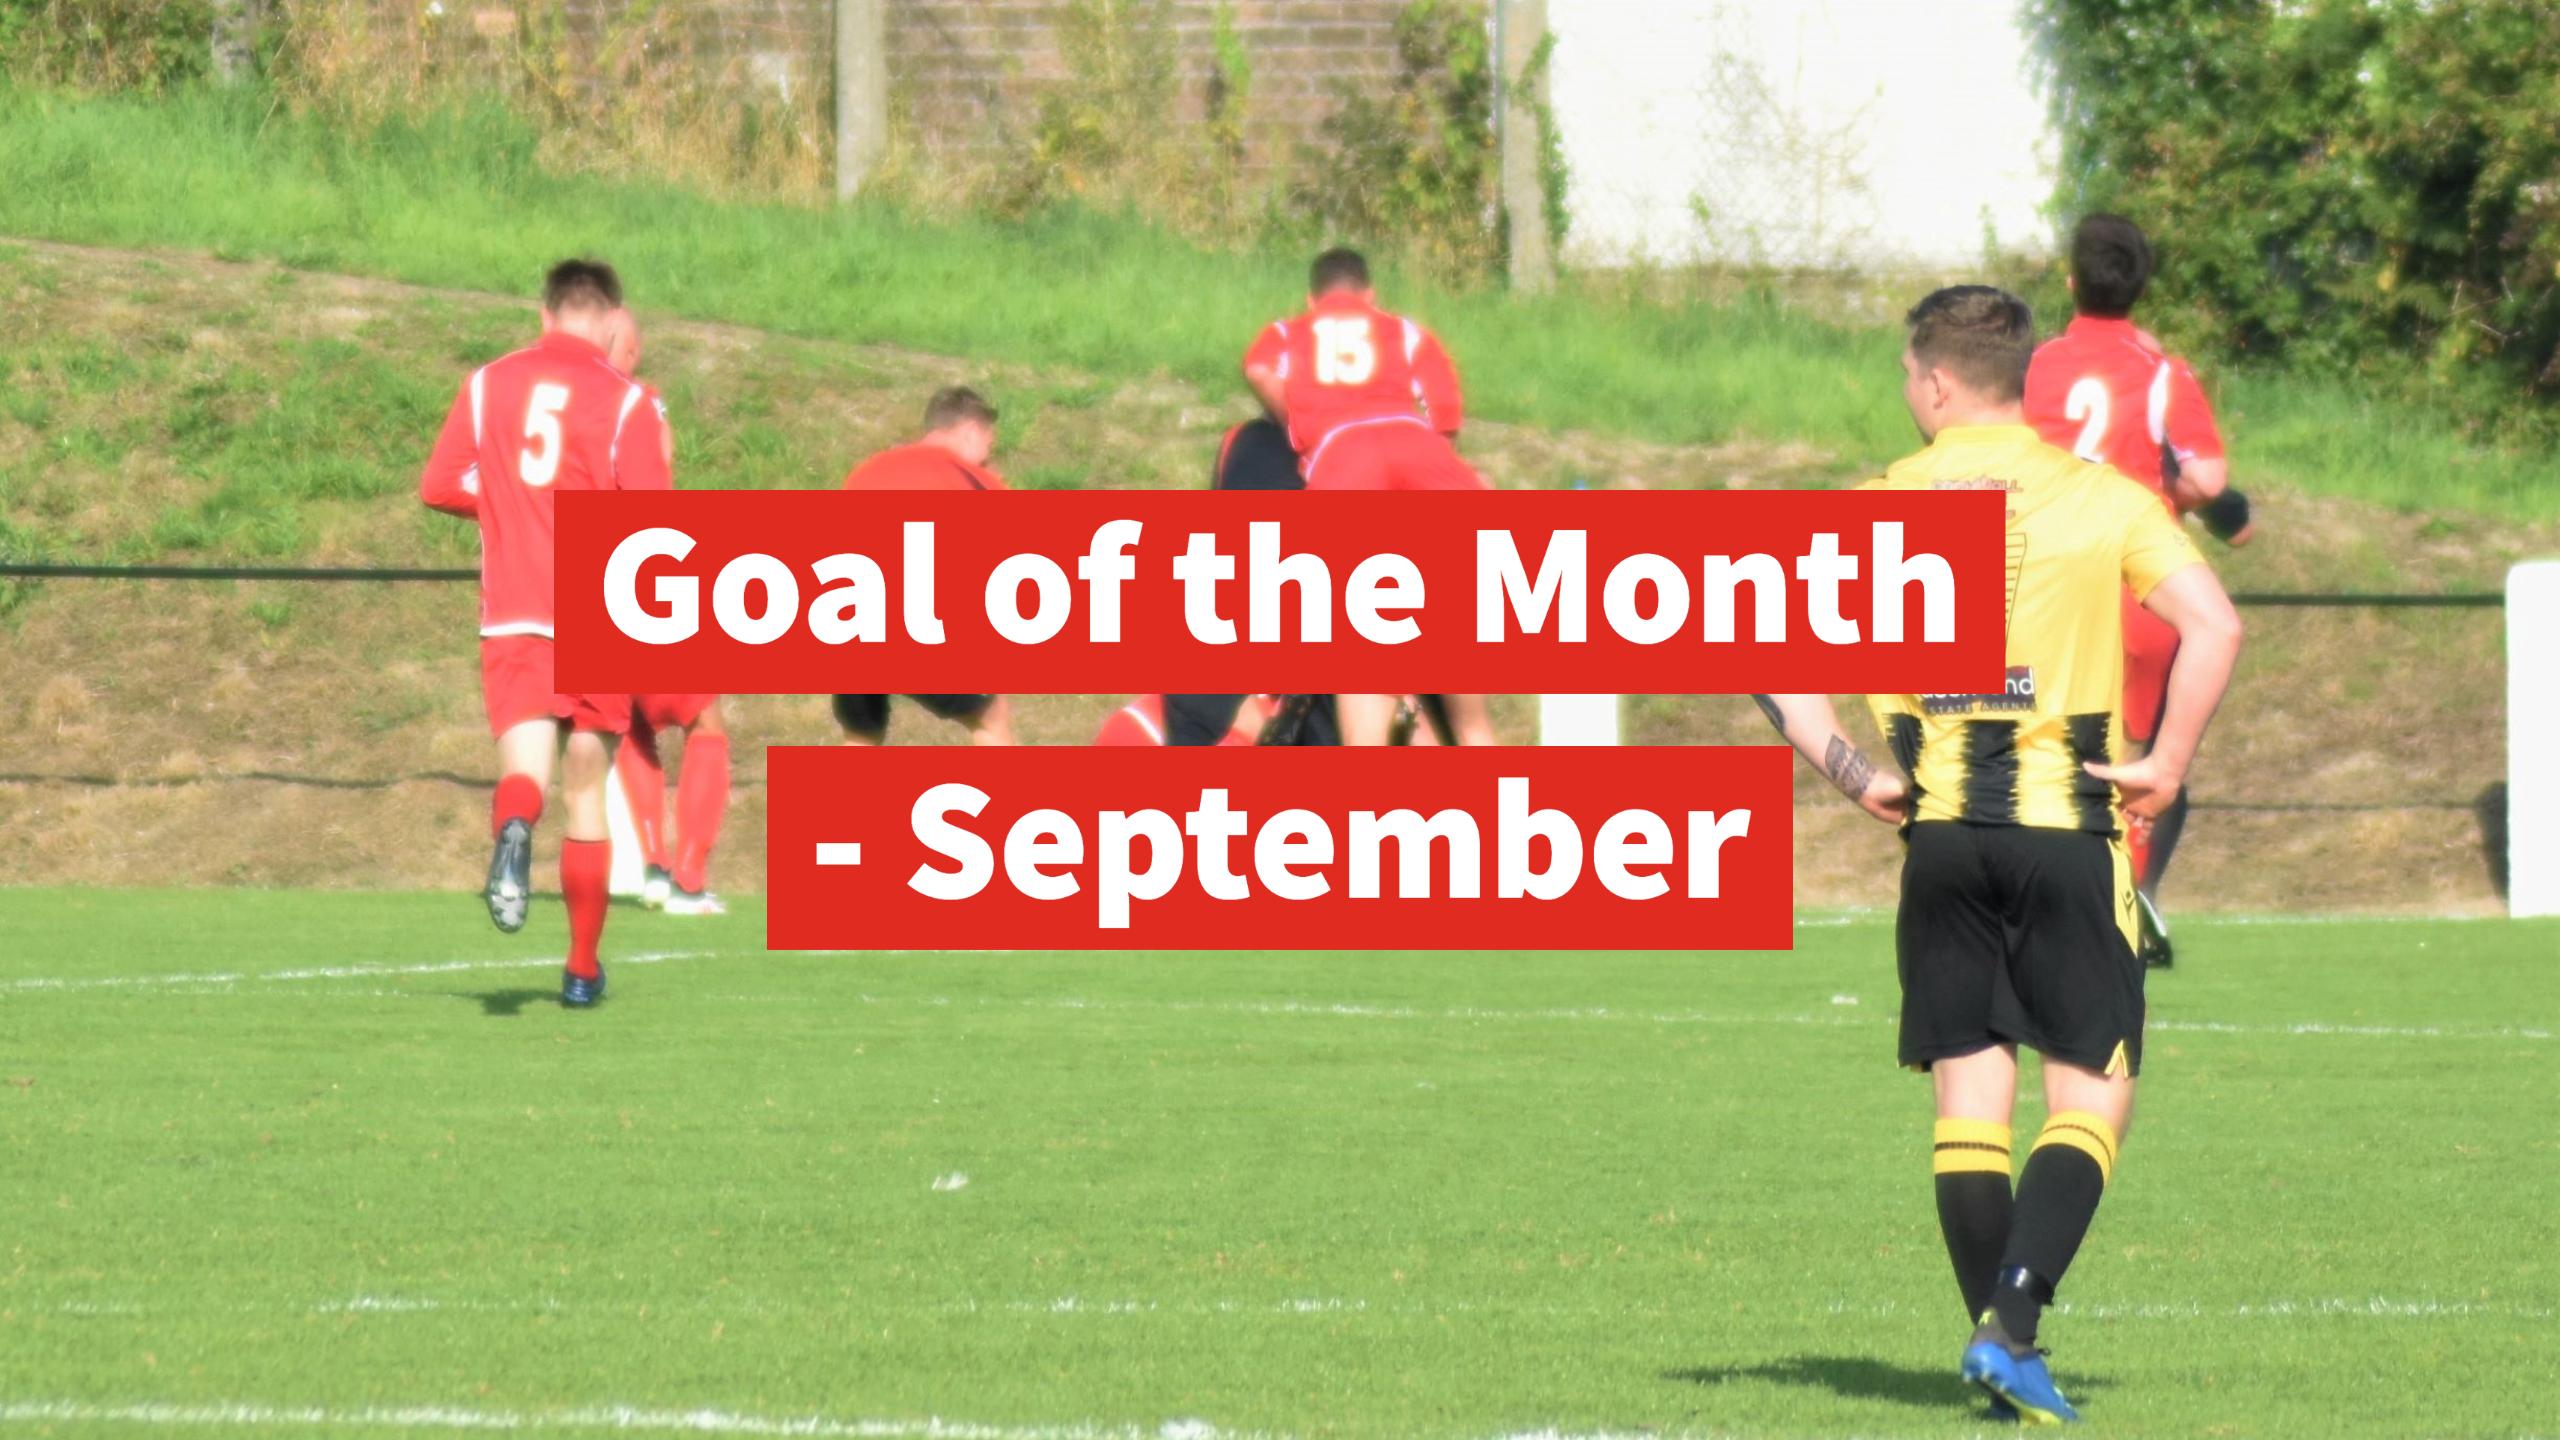 Goal of the Month - September